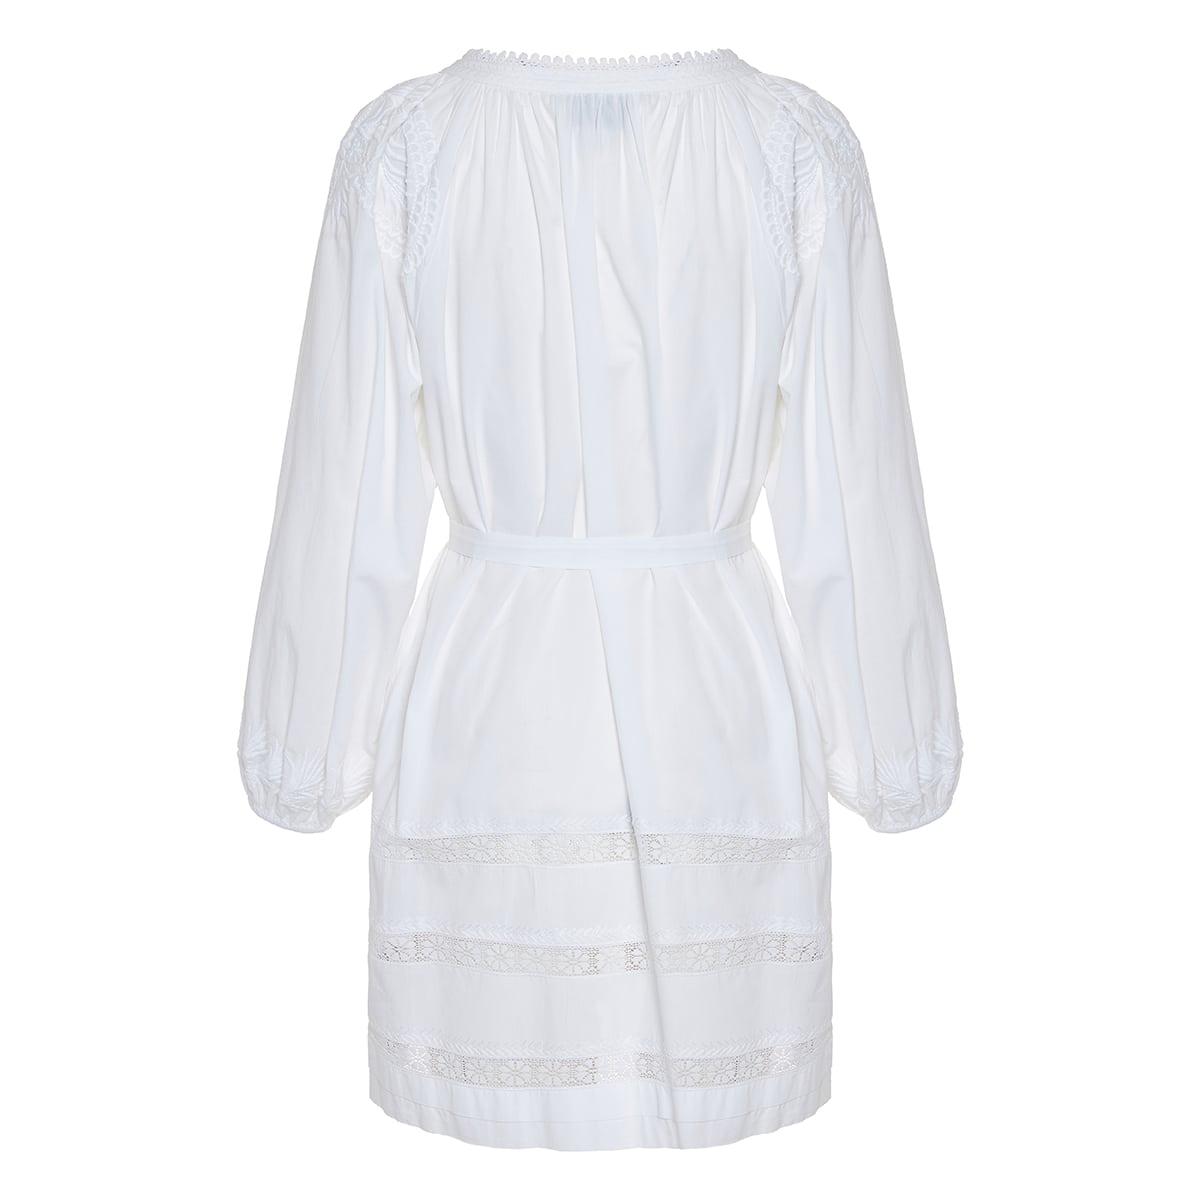 Balloon-sleeved emrboidered cotton dress